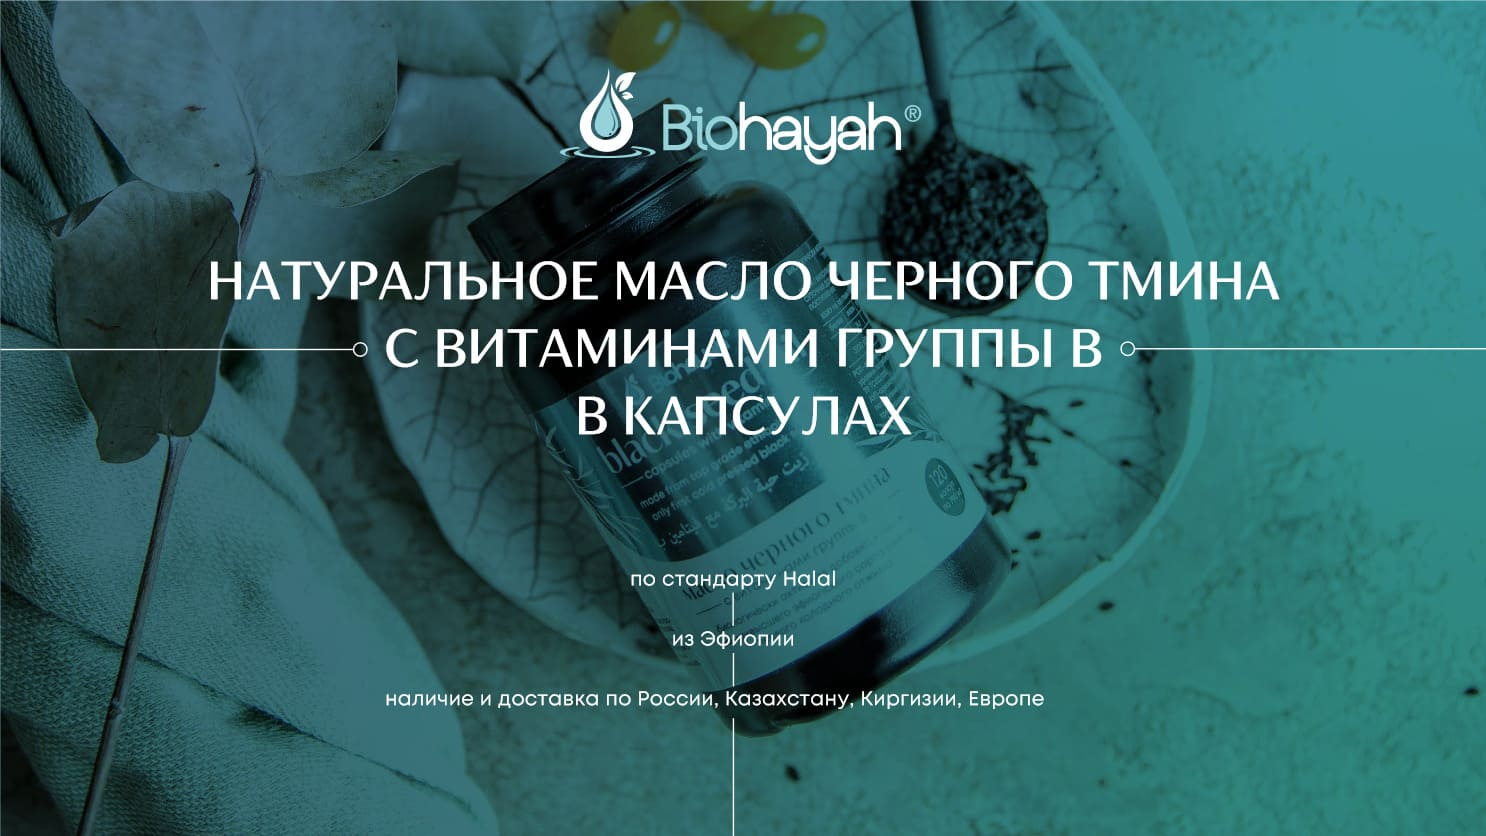 Масло черного тмина в капсулах Biohayah